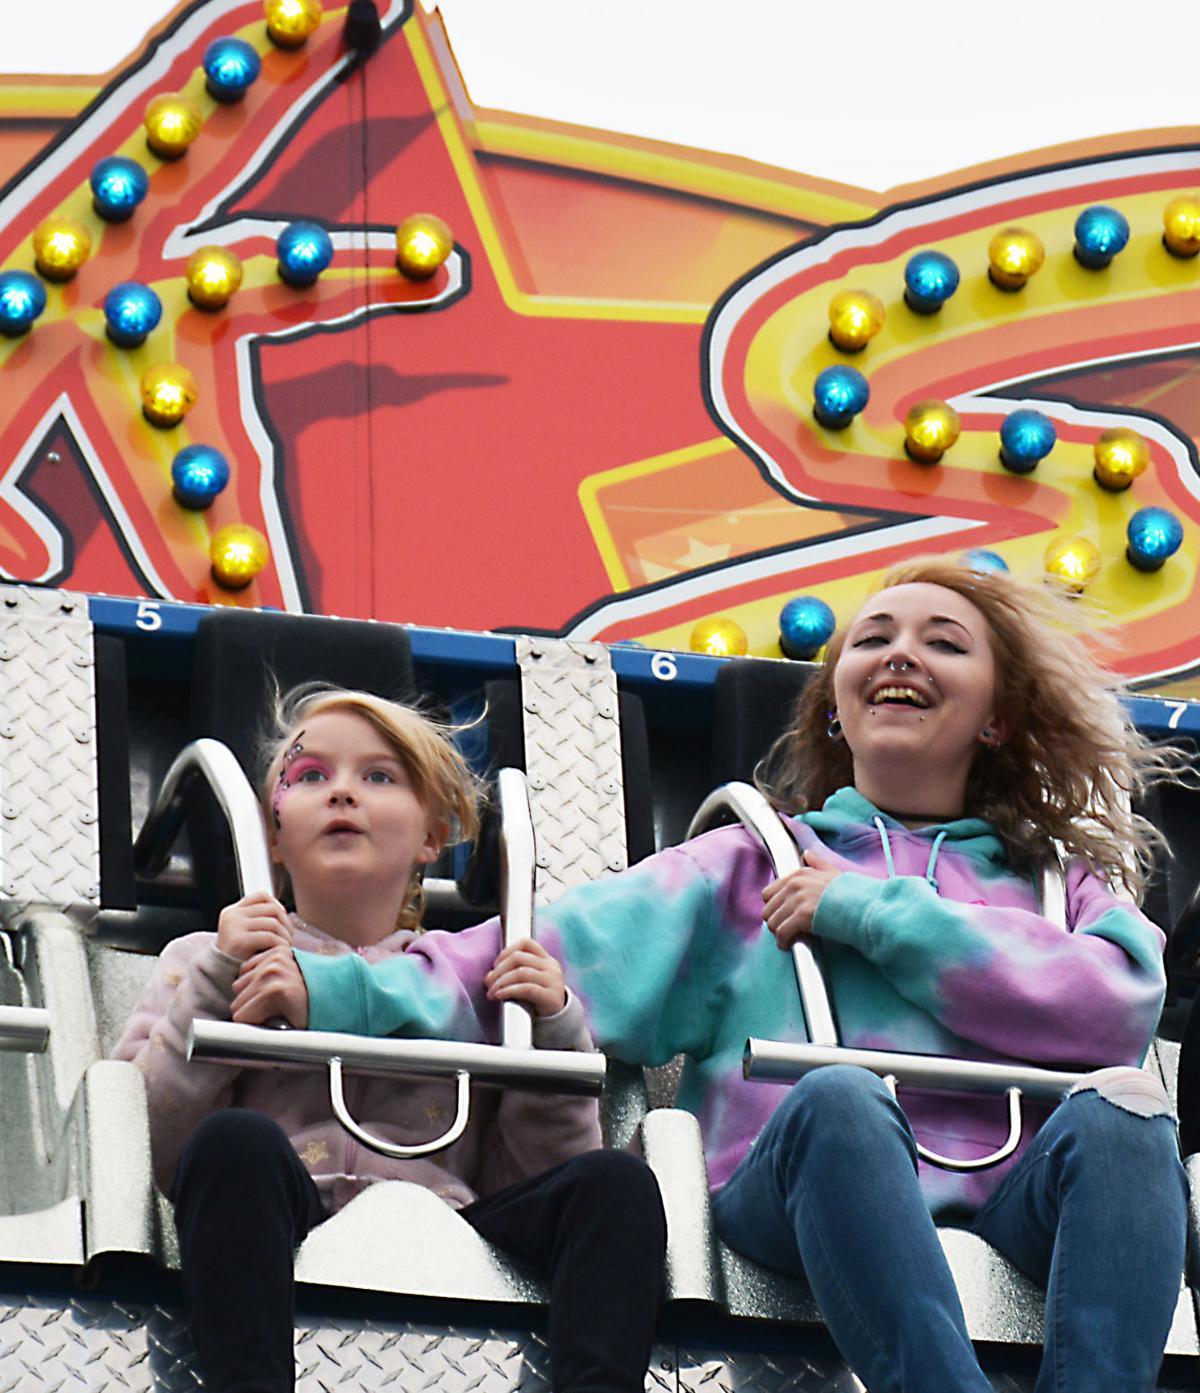 girls on rockstar ride.jpg